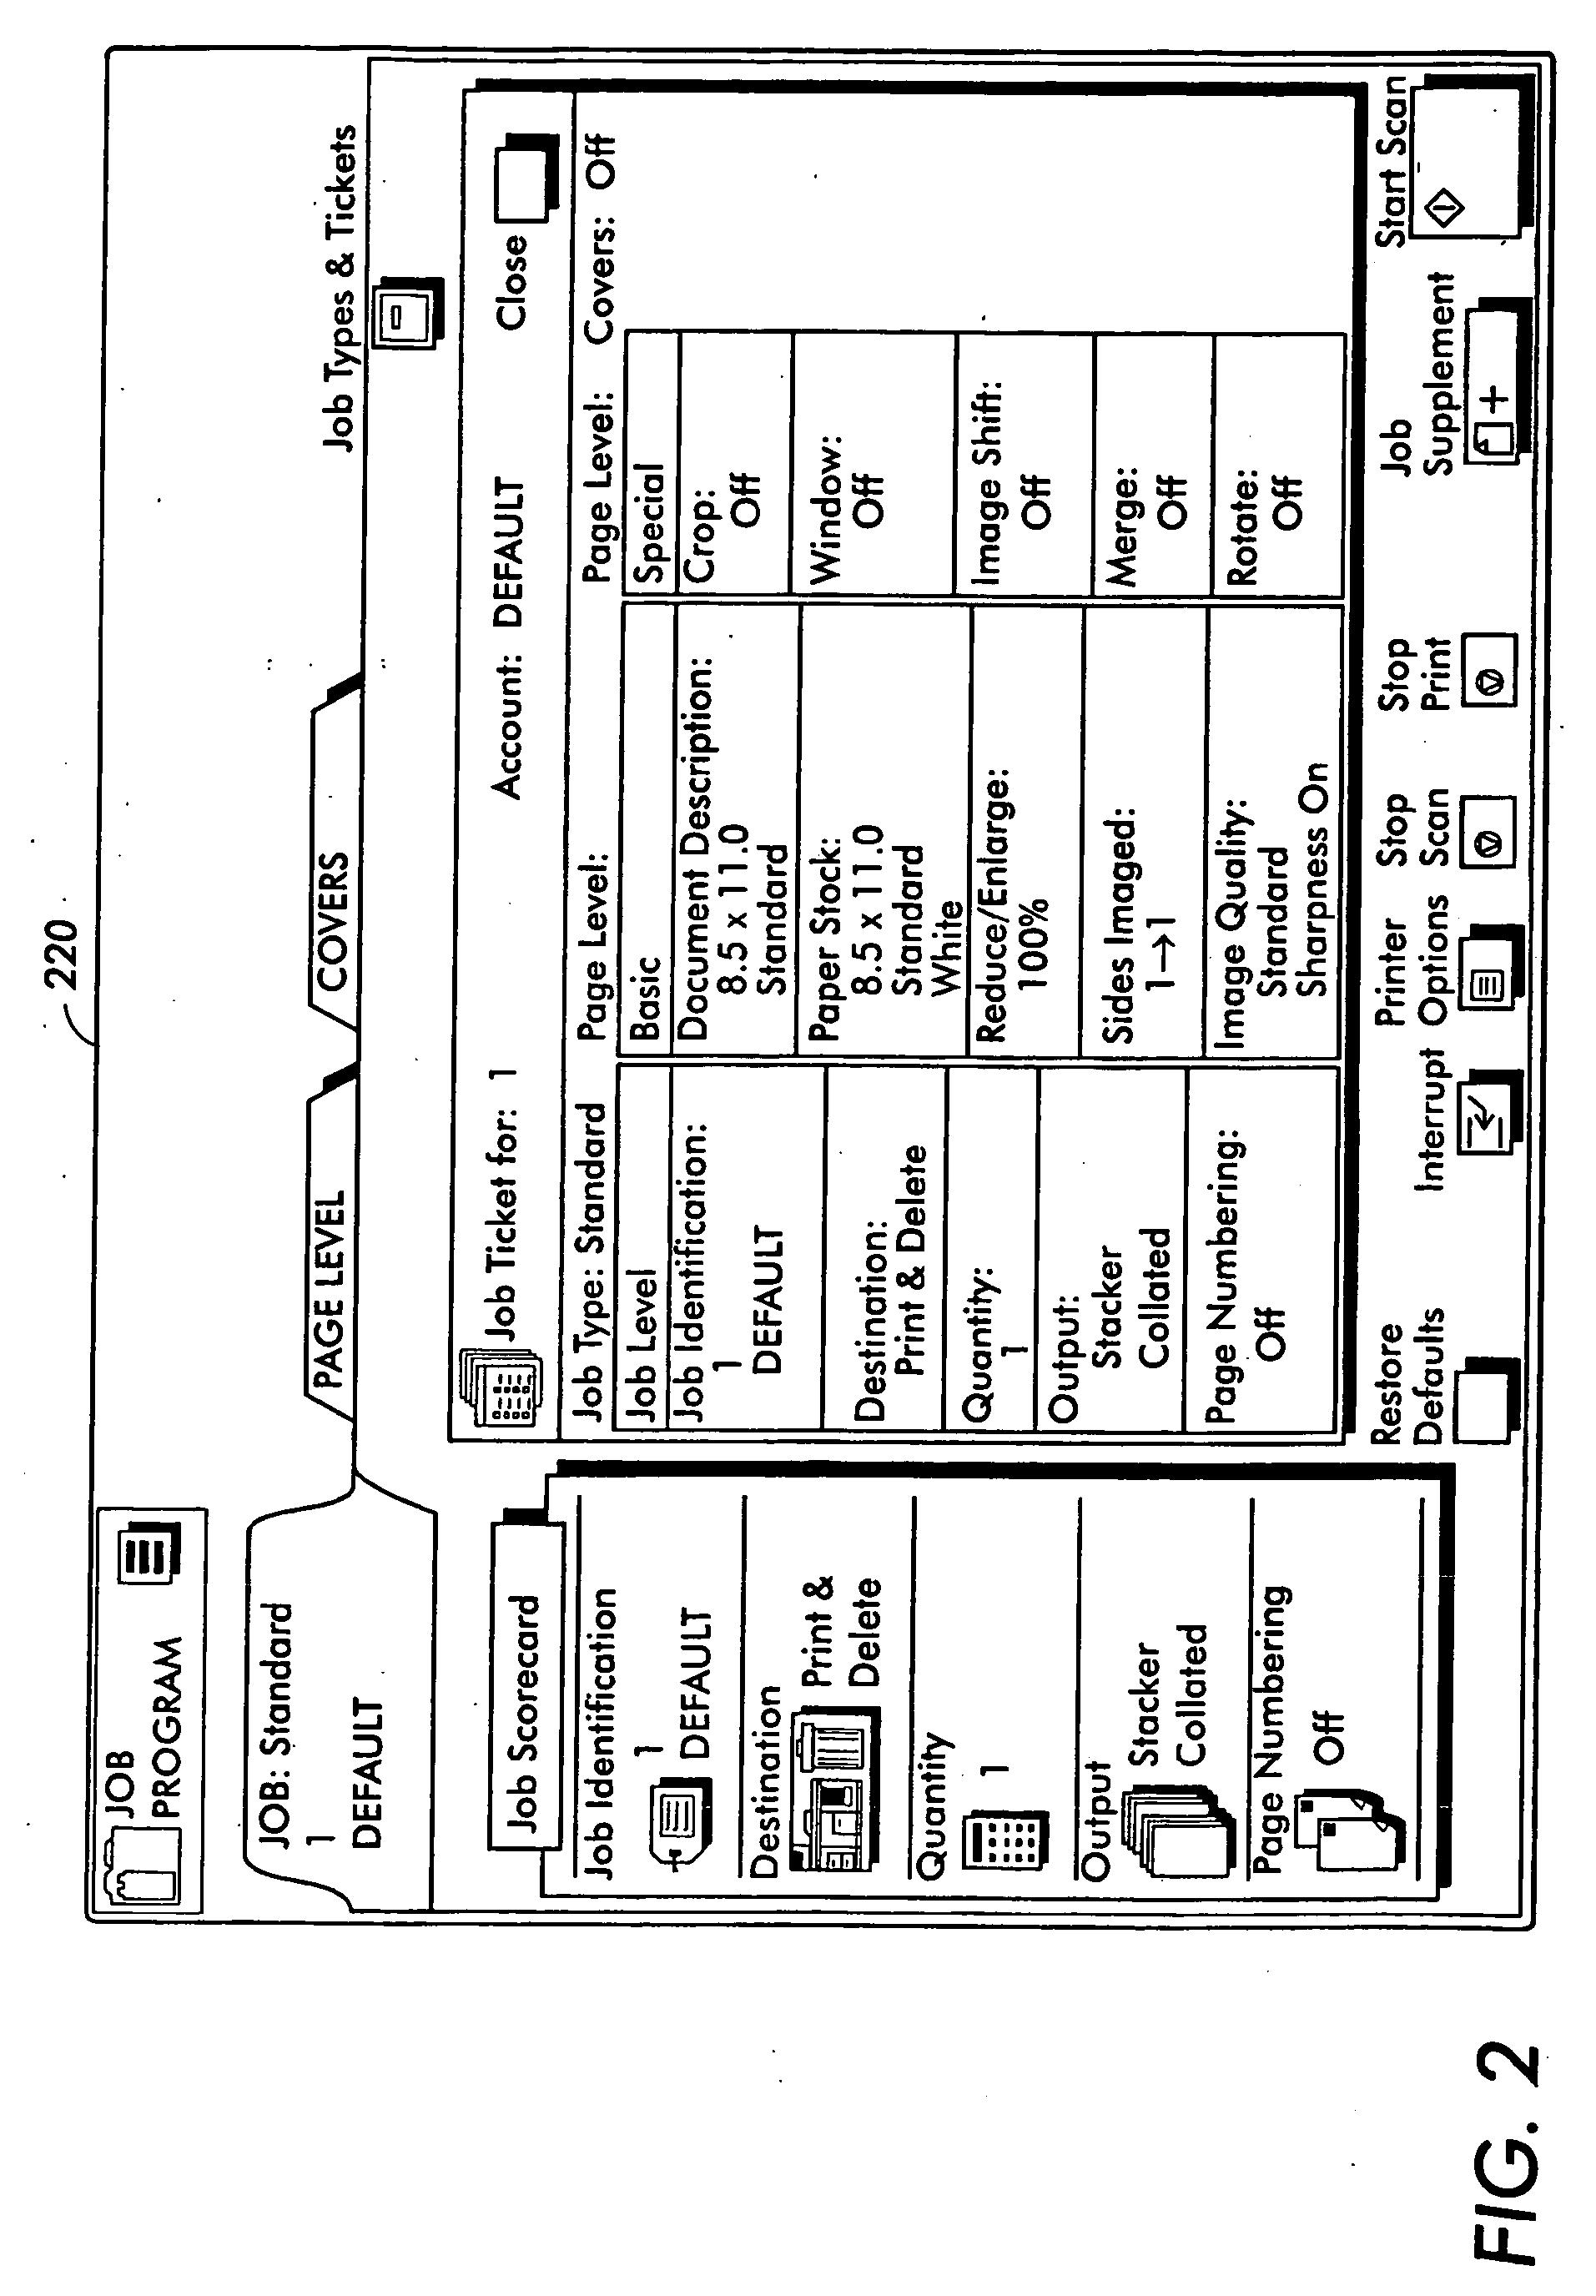 专利ep1548634b1 - systèmes